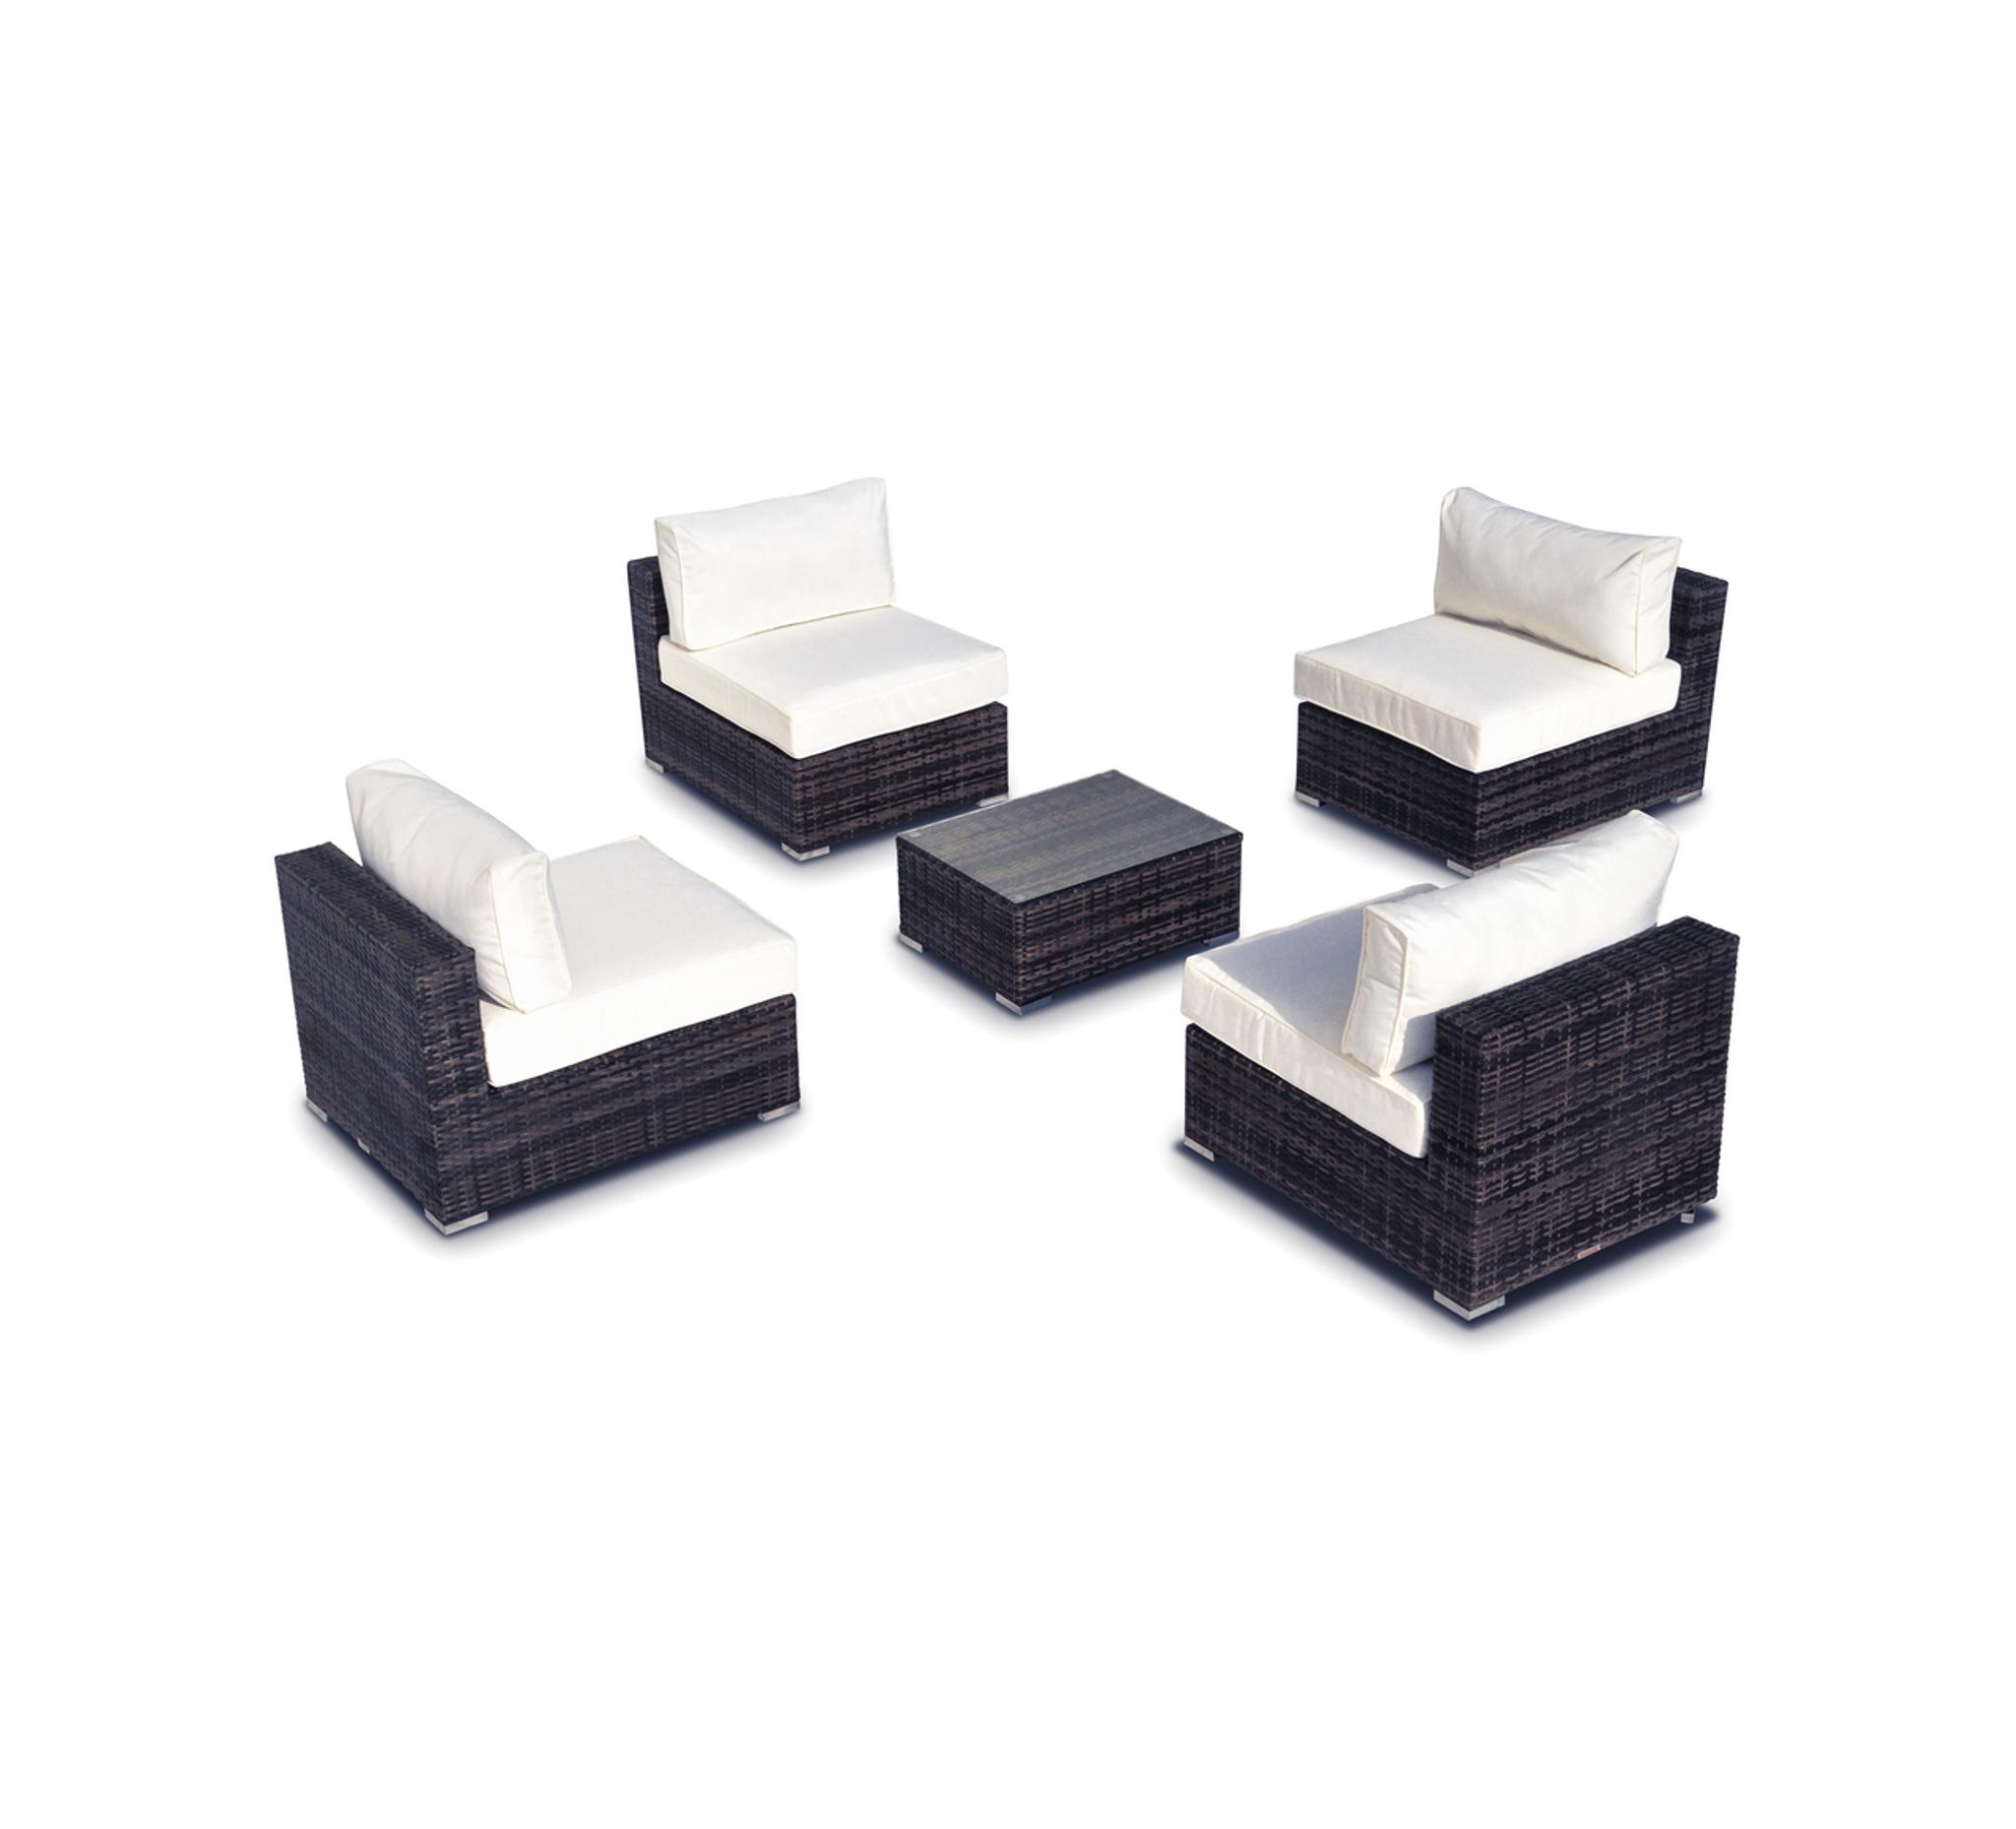 Phenomenal Vilano 5 Piece Sectional Unemploymentrelief Wooden Chair Designs For Living Room Unemploymentrelieforg